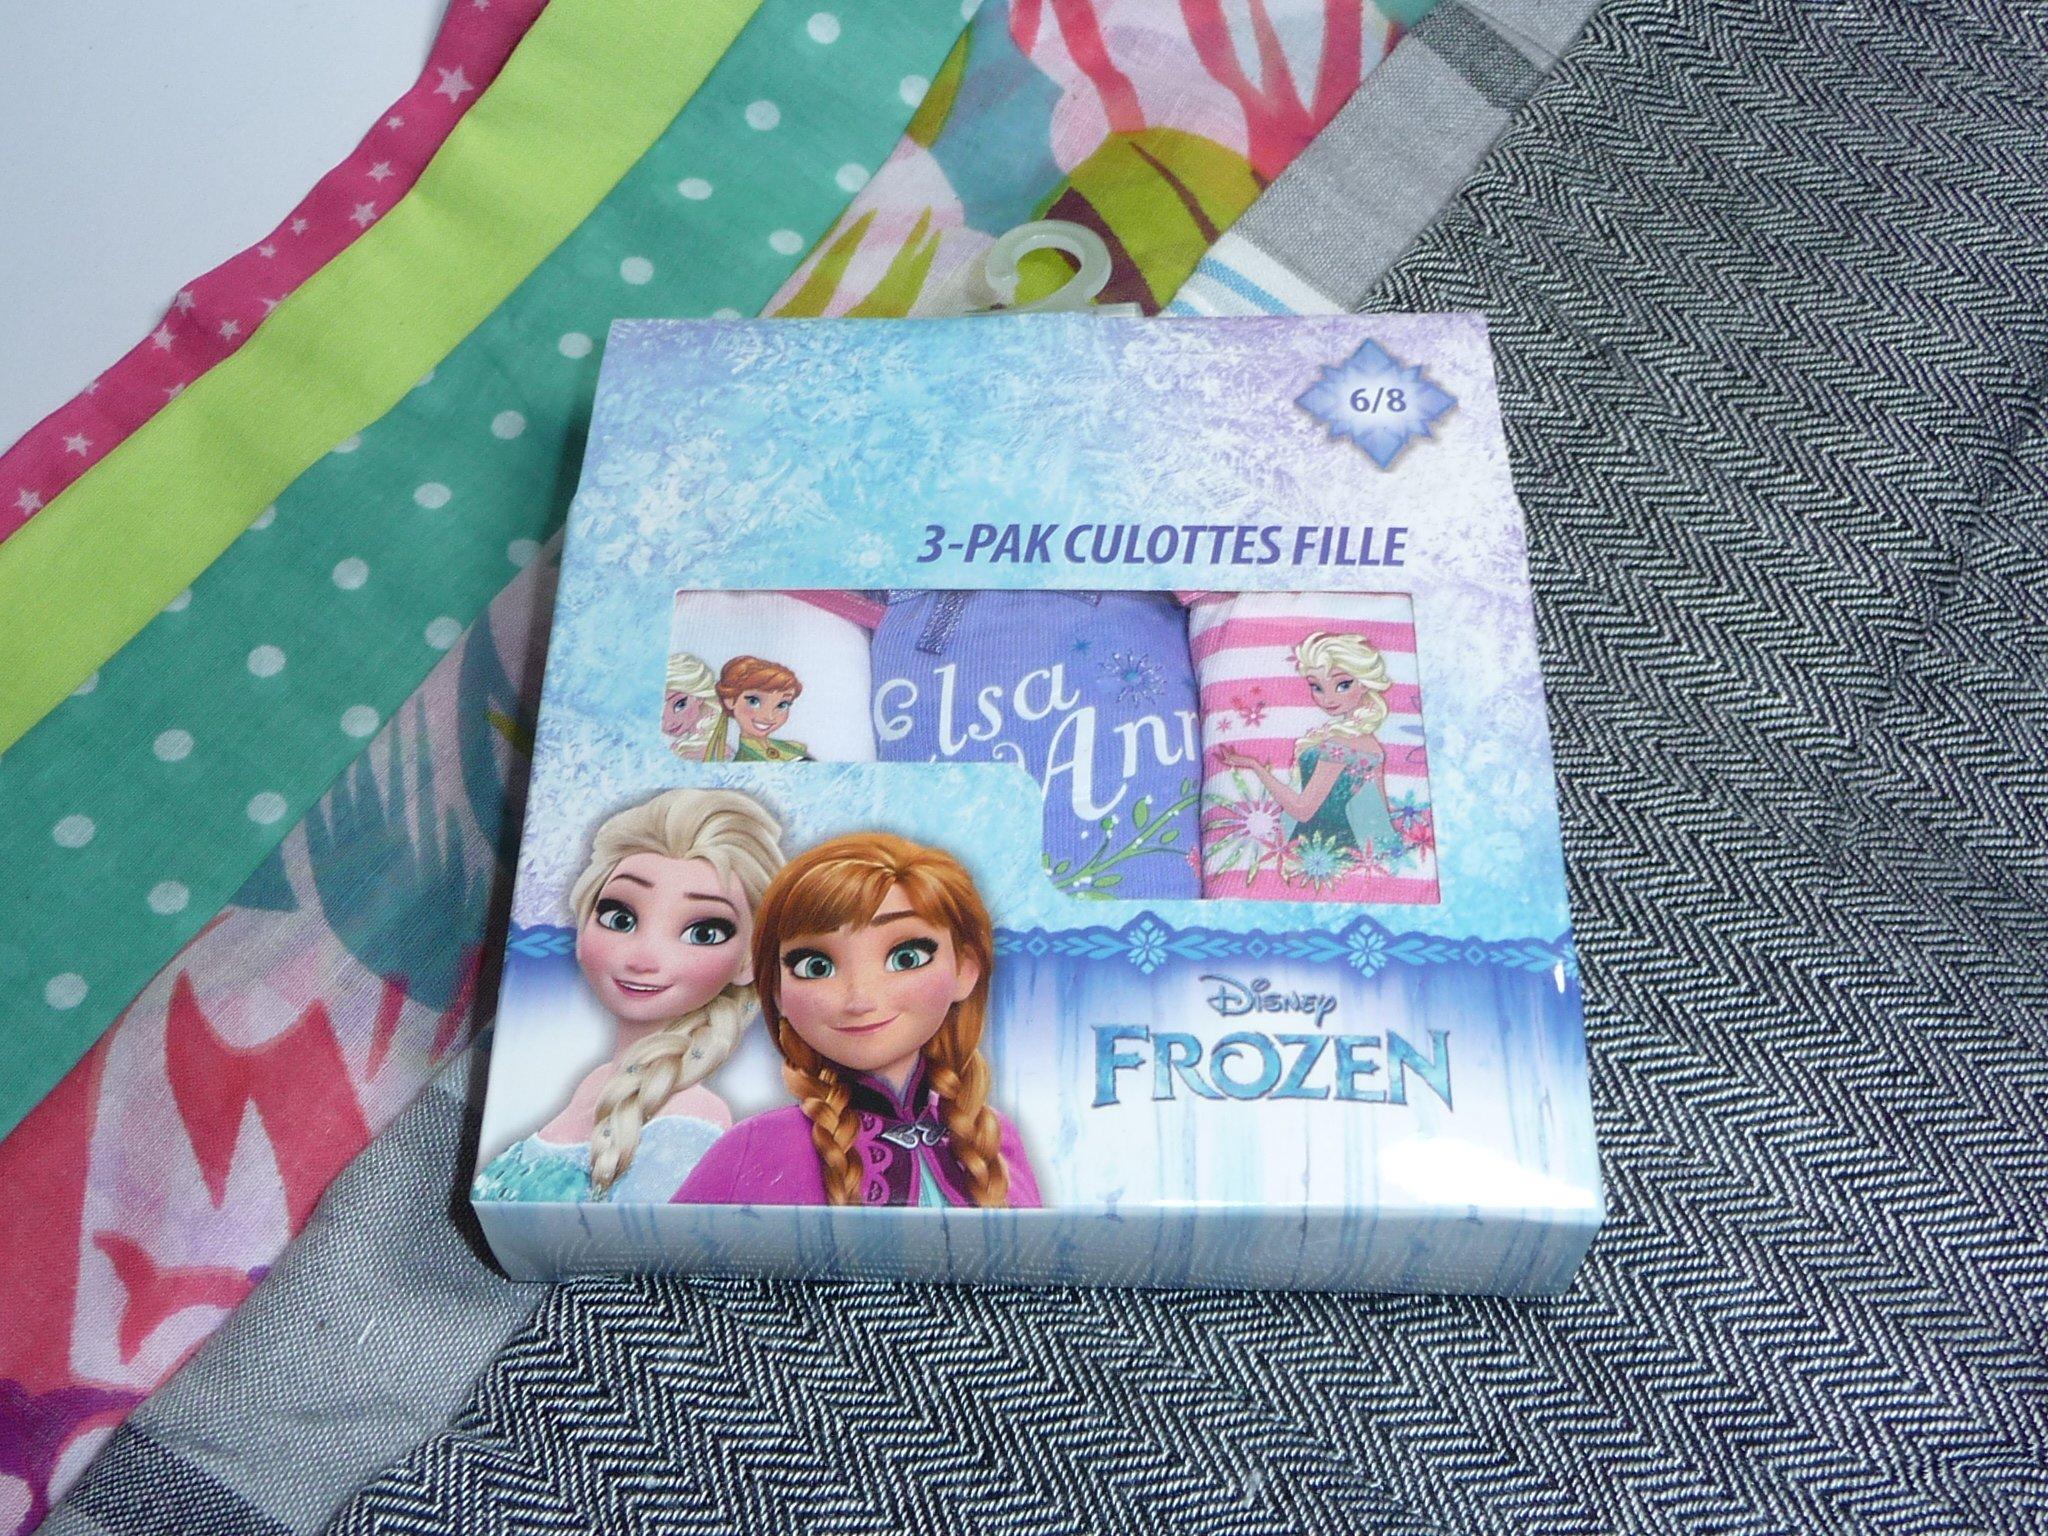 Majtki Disney FROZEN 3pak 6/8 lat + SZALIK gratis